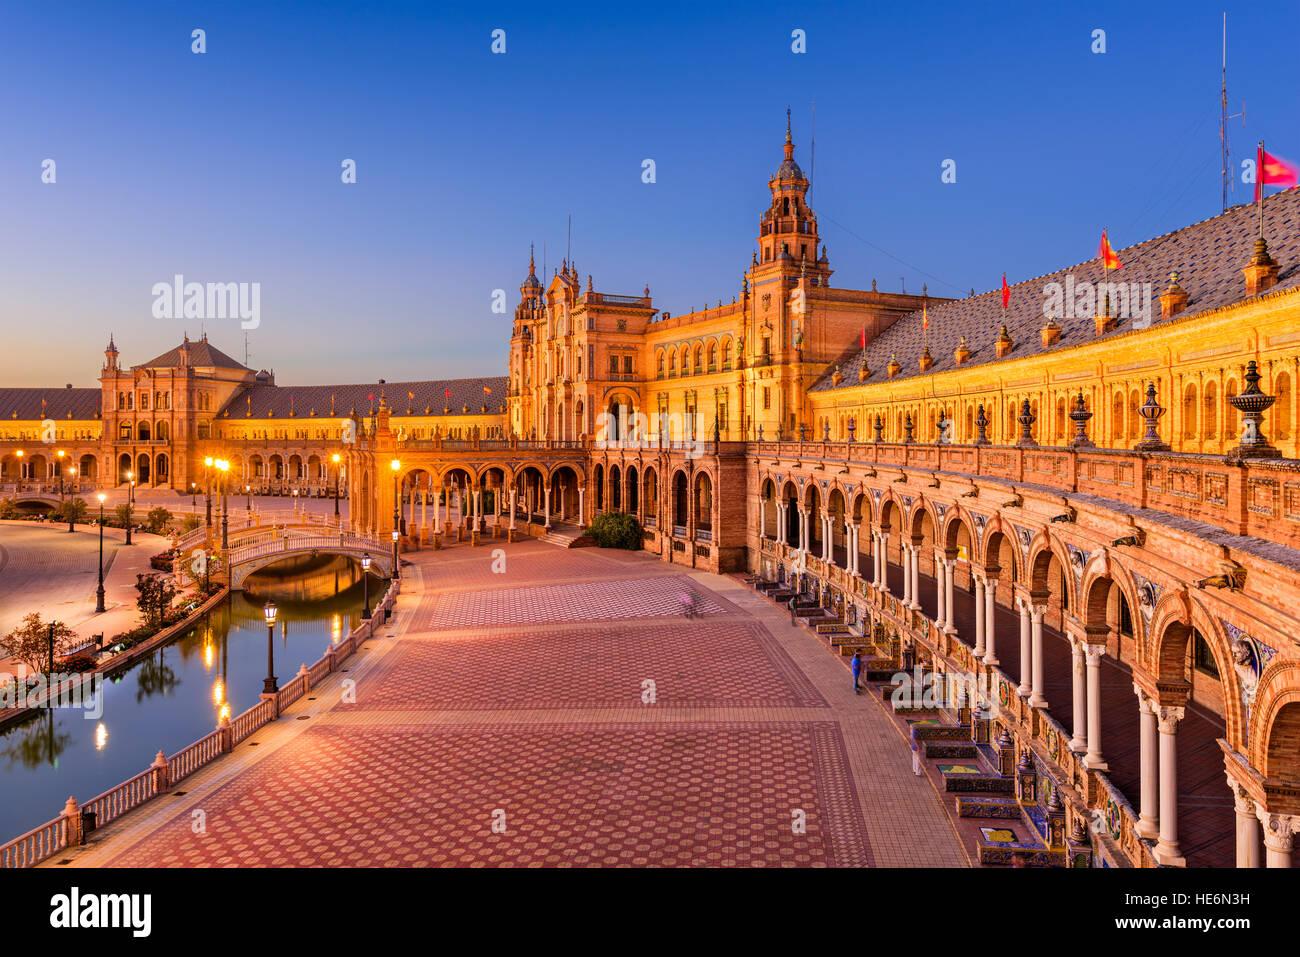 Seville, Spain at Spanish Square. - Stock Image